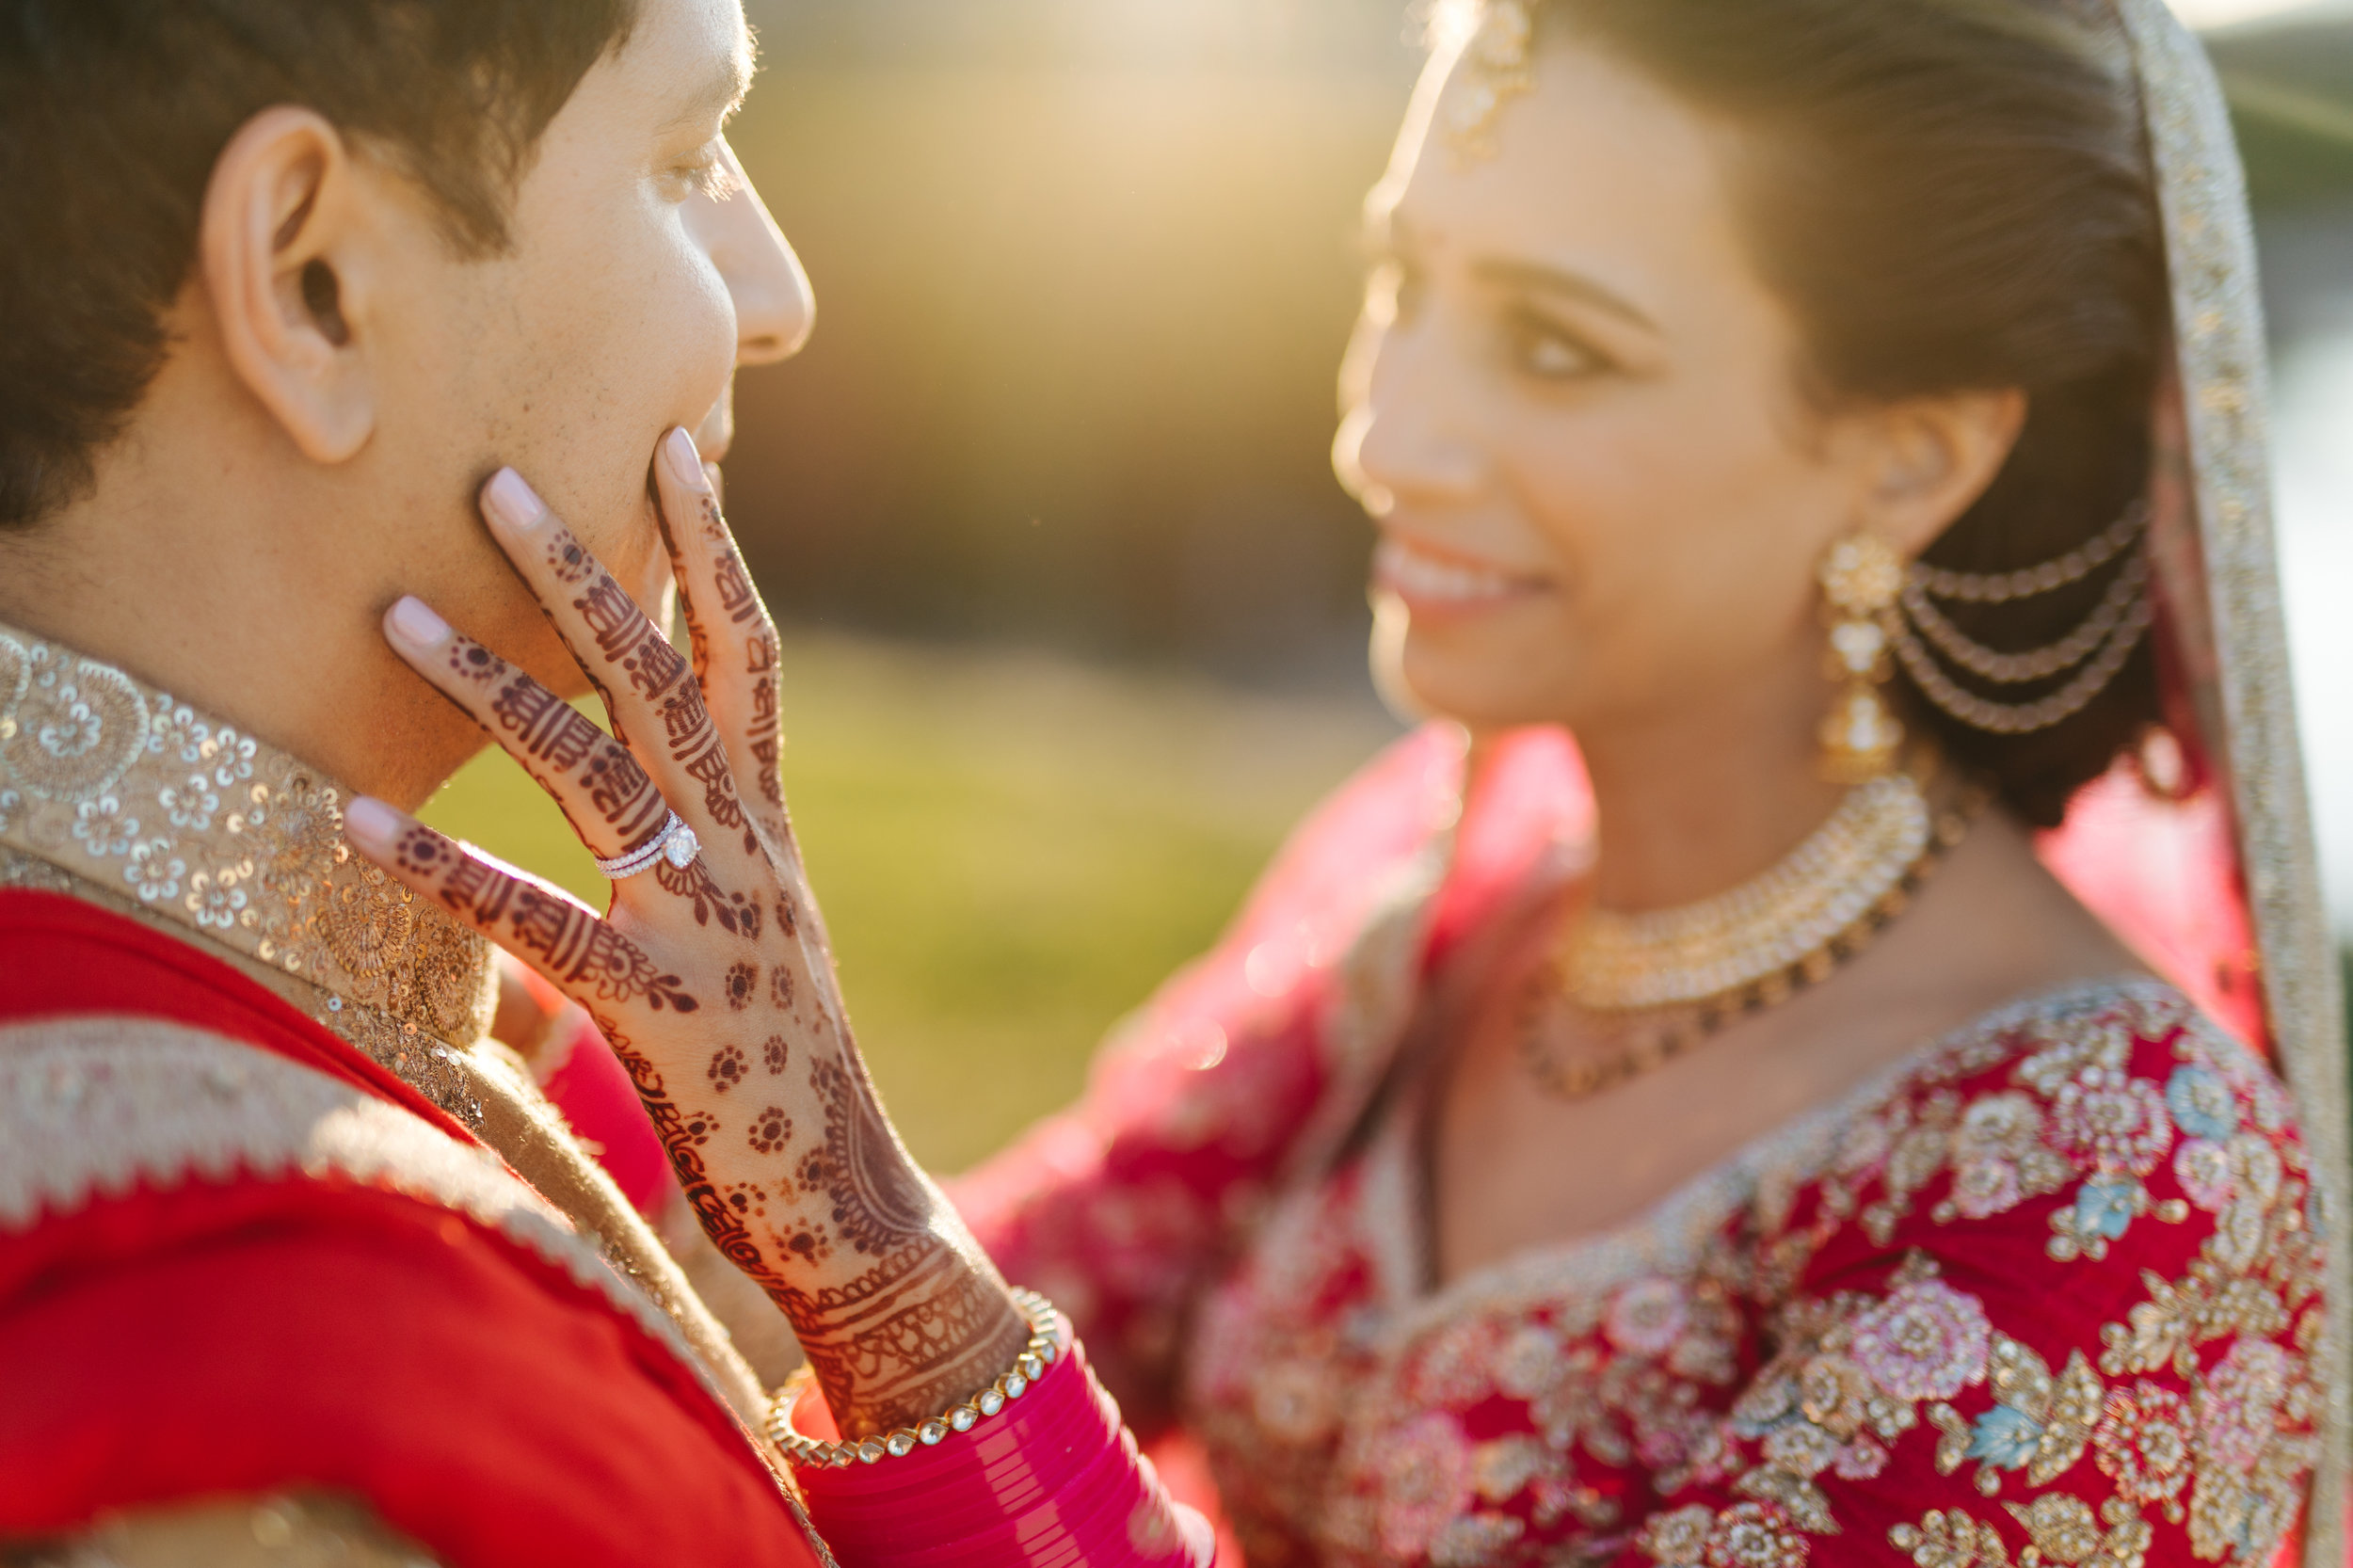 herastudios_wedding_minna_rajesh_hera_selects-98.jpg